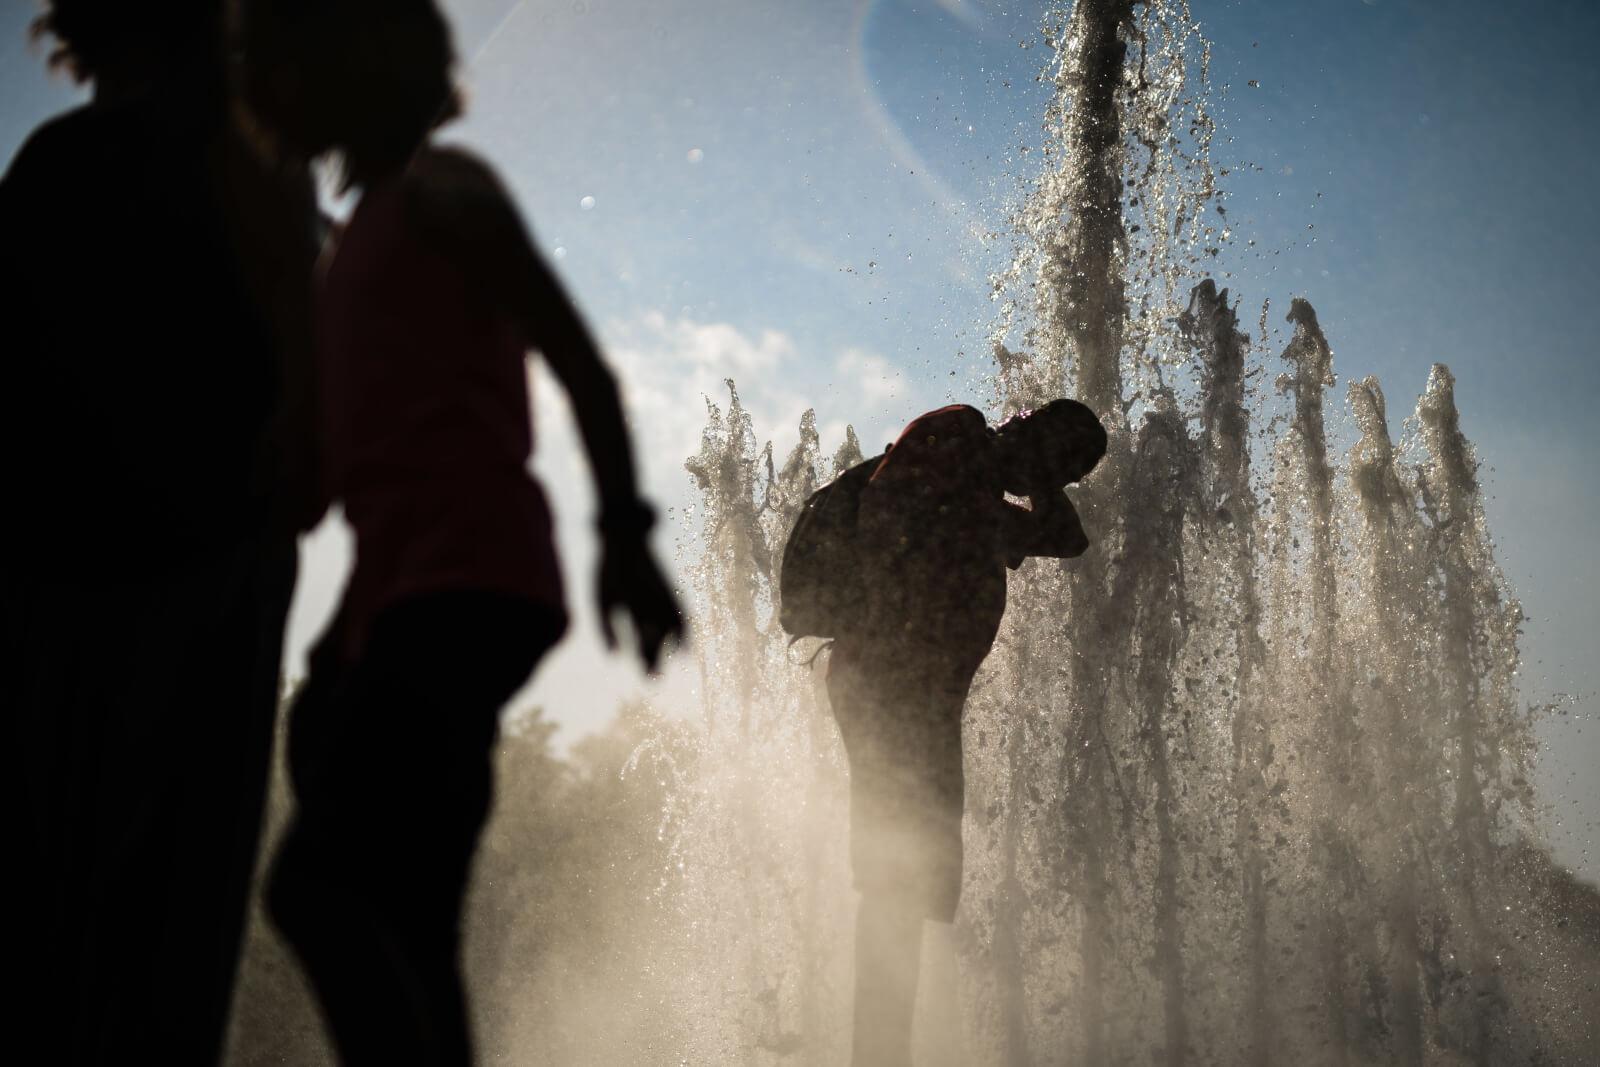 Berlin fot. EPA/CLEMENS BILAN